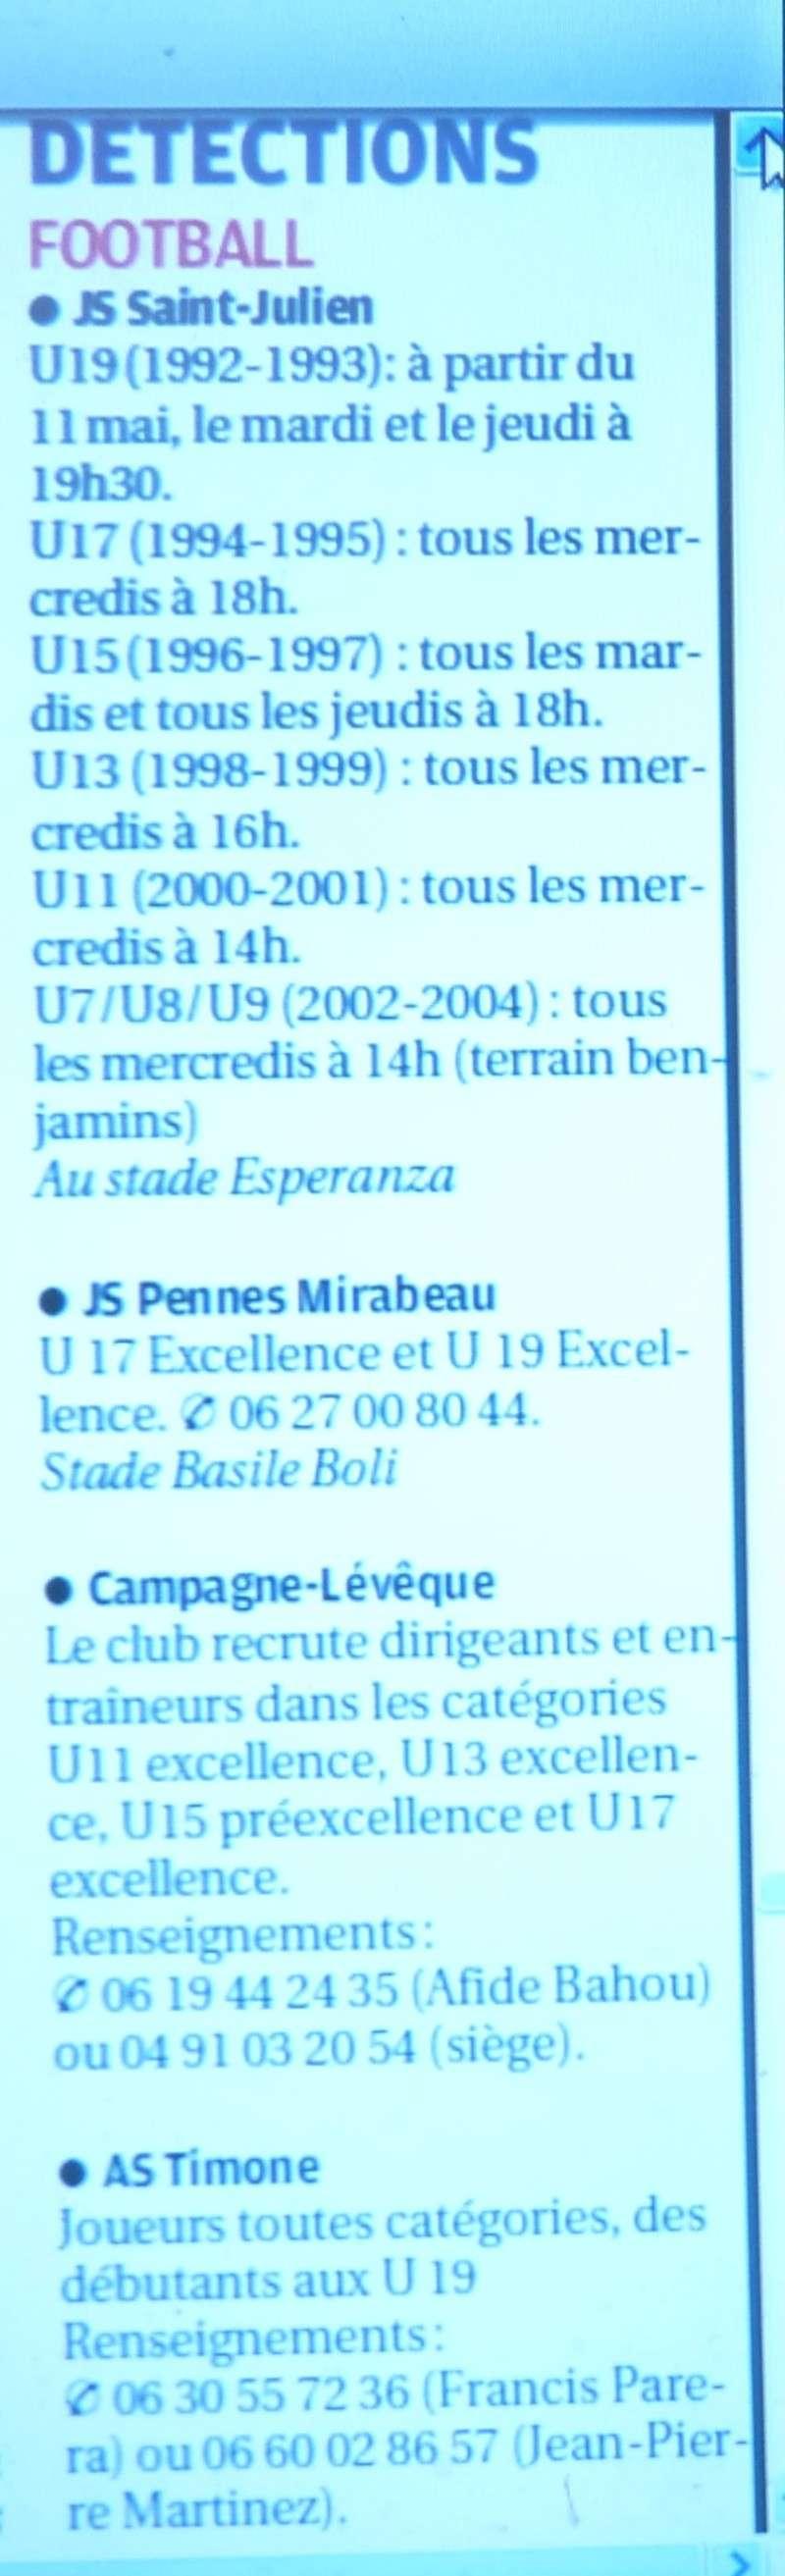 INFOS GENERALES MEDITERRANEENS AMATEURS - Page 3 P1080523